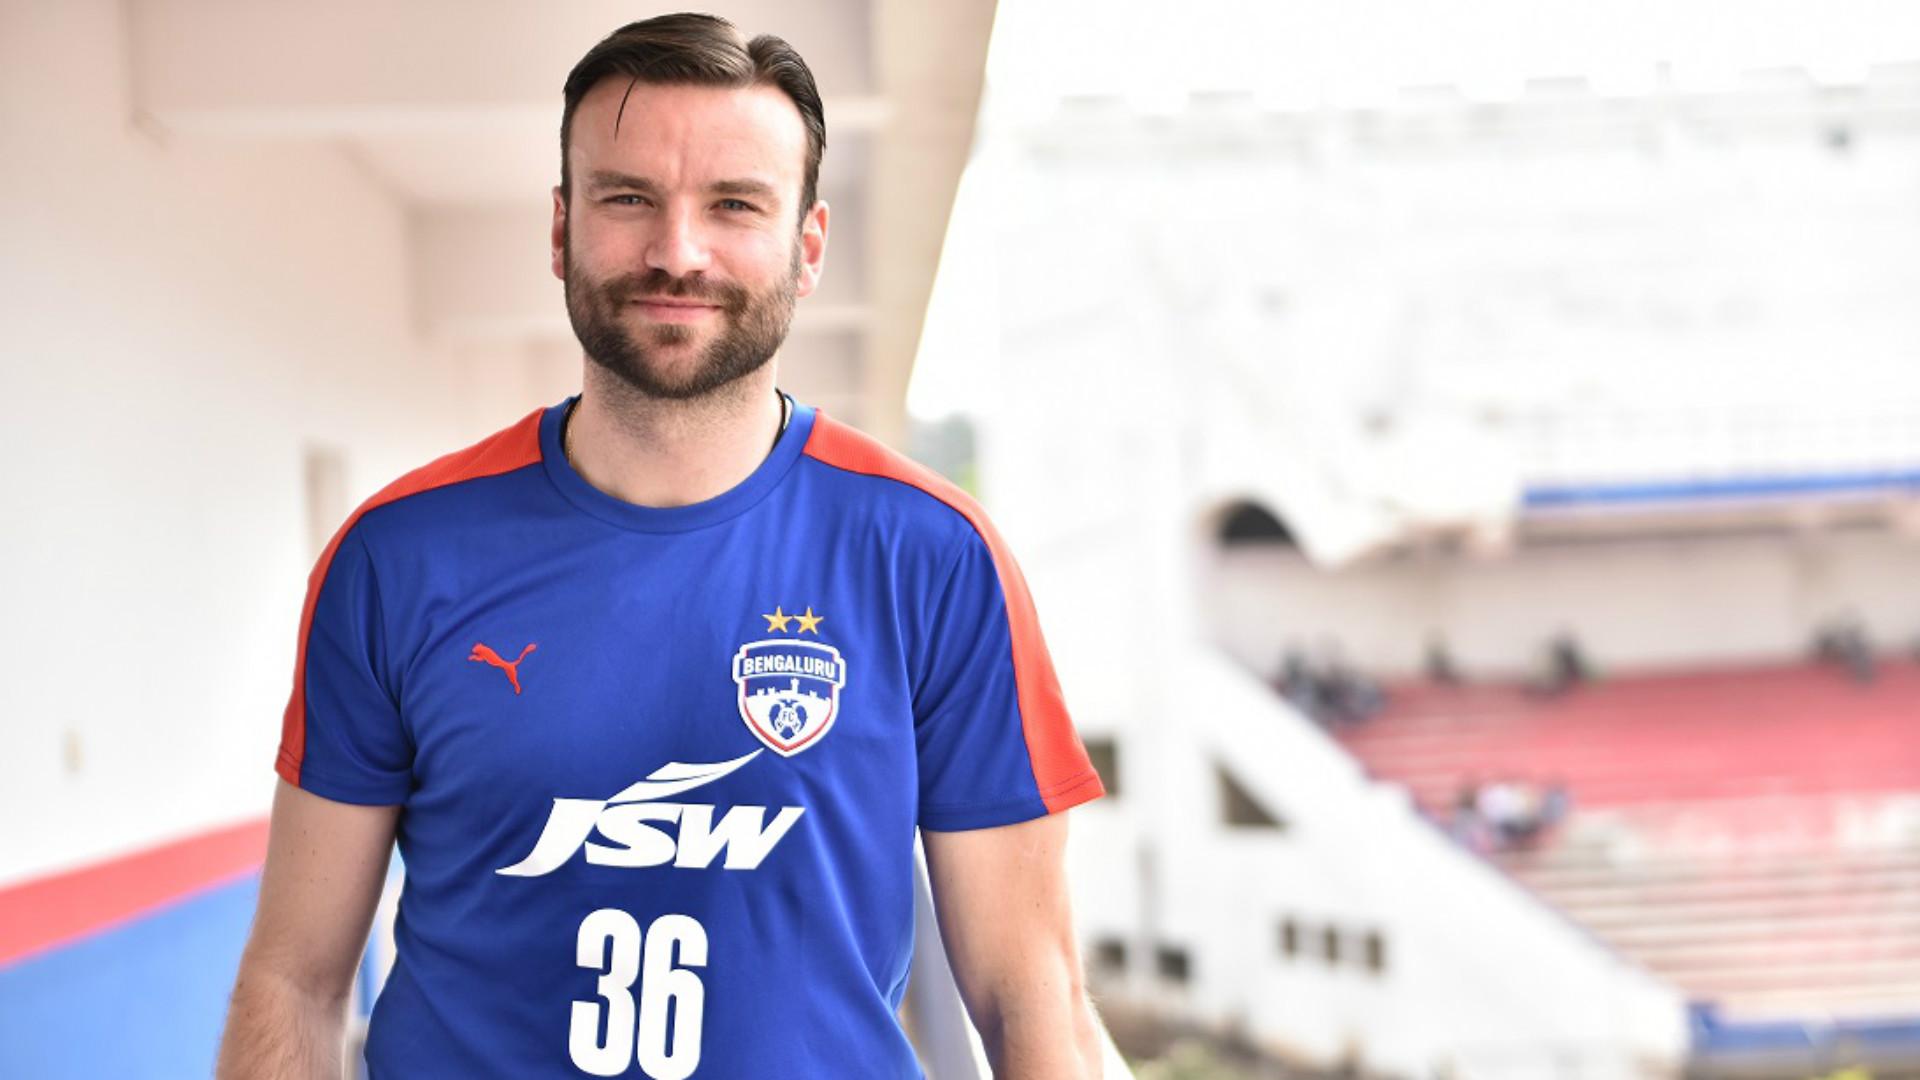 Marjan Jugovic Bengaluru FC